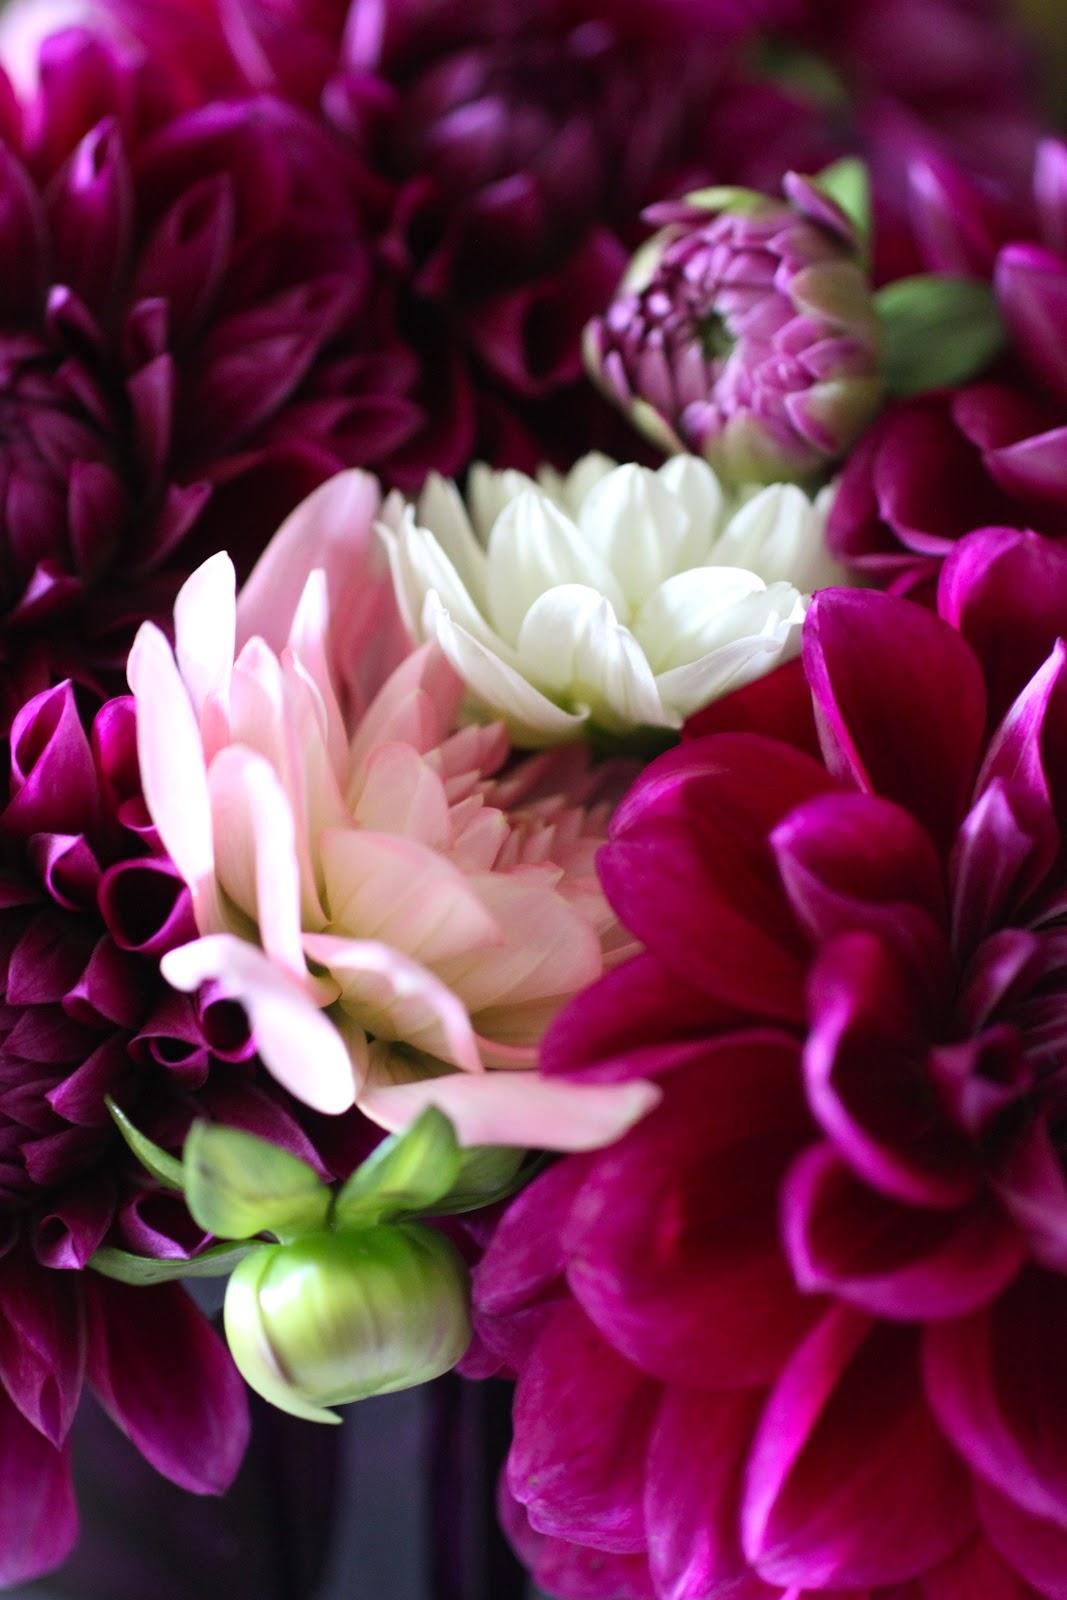 Reggie Darling: Autumn Flowers